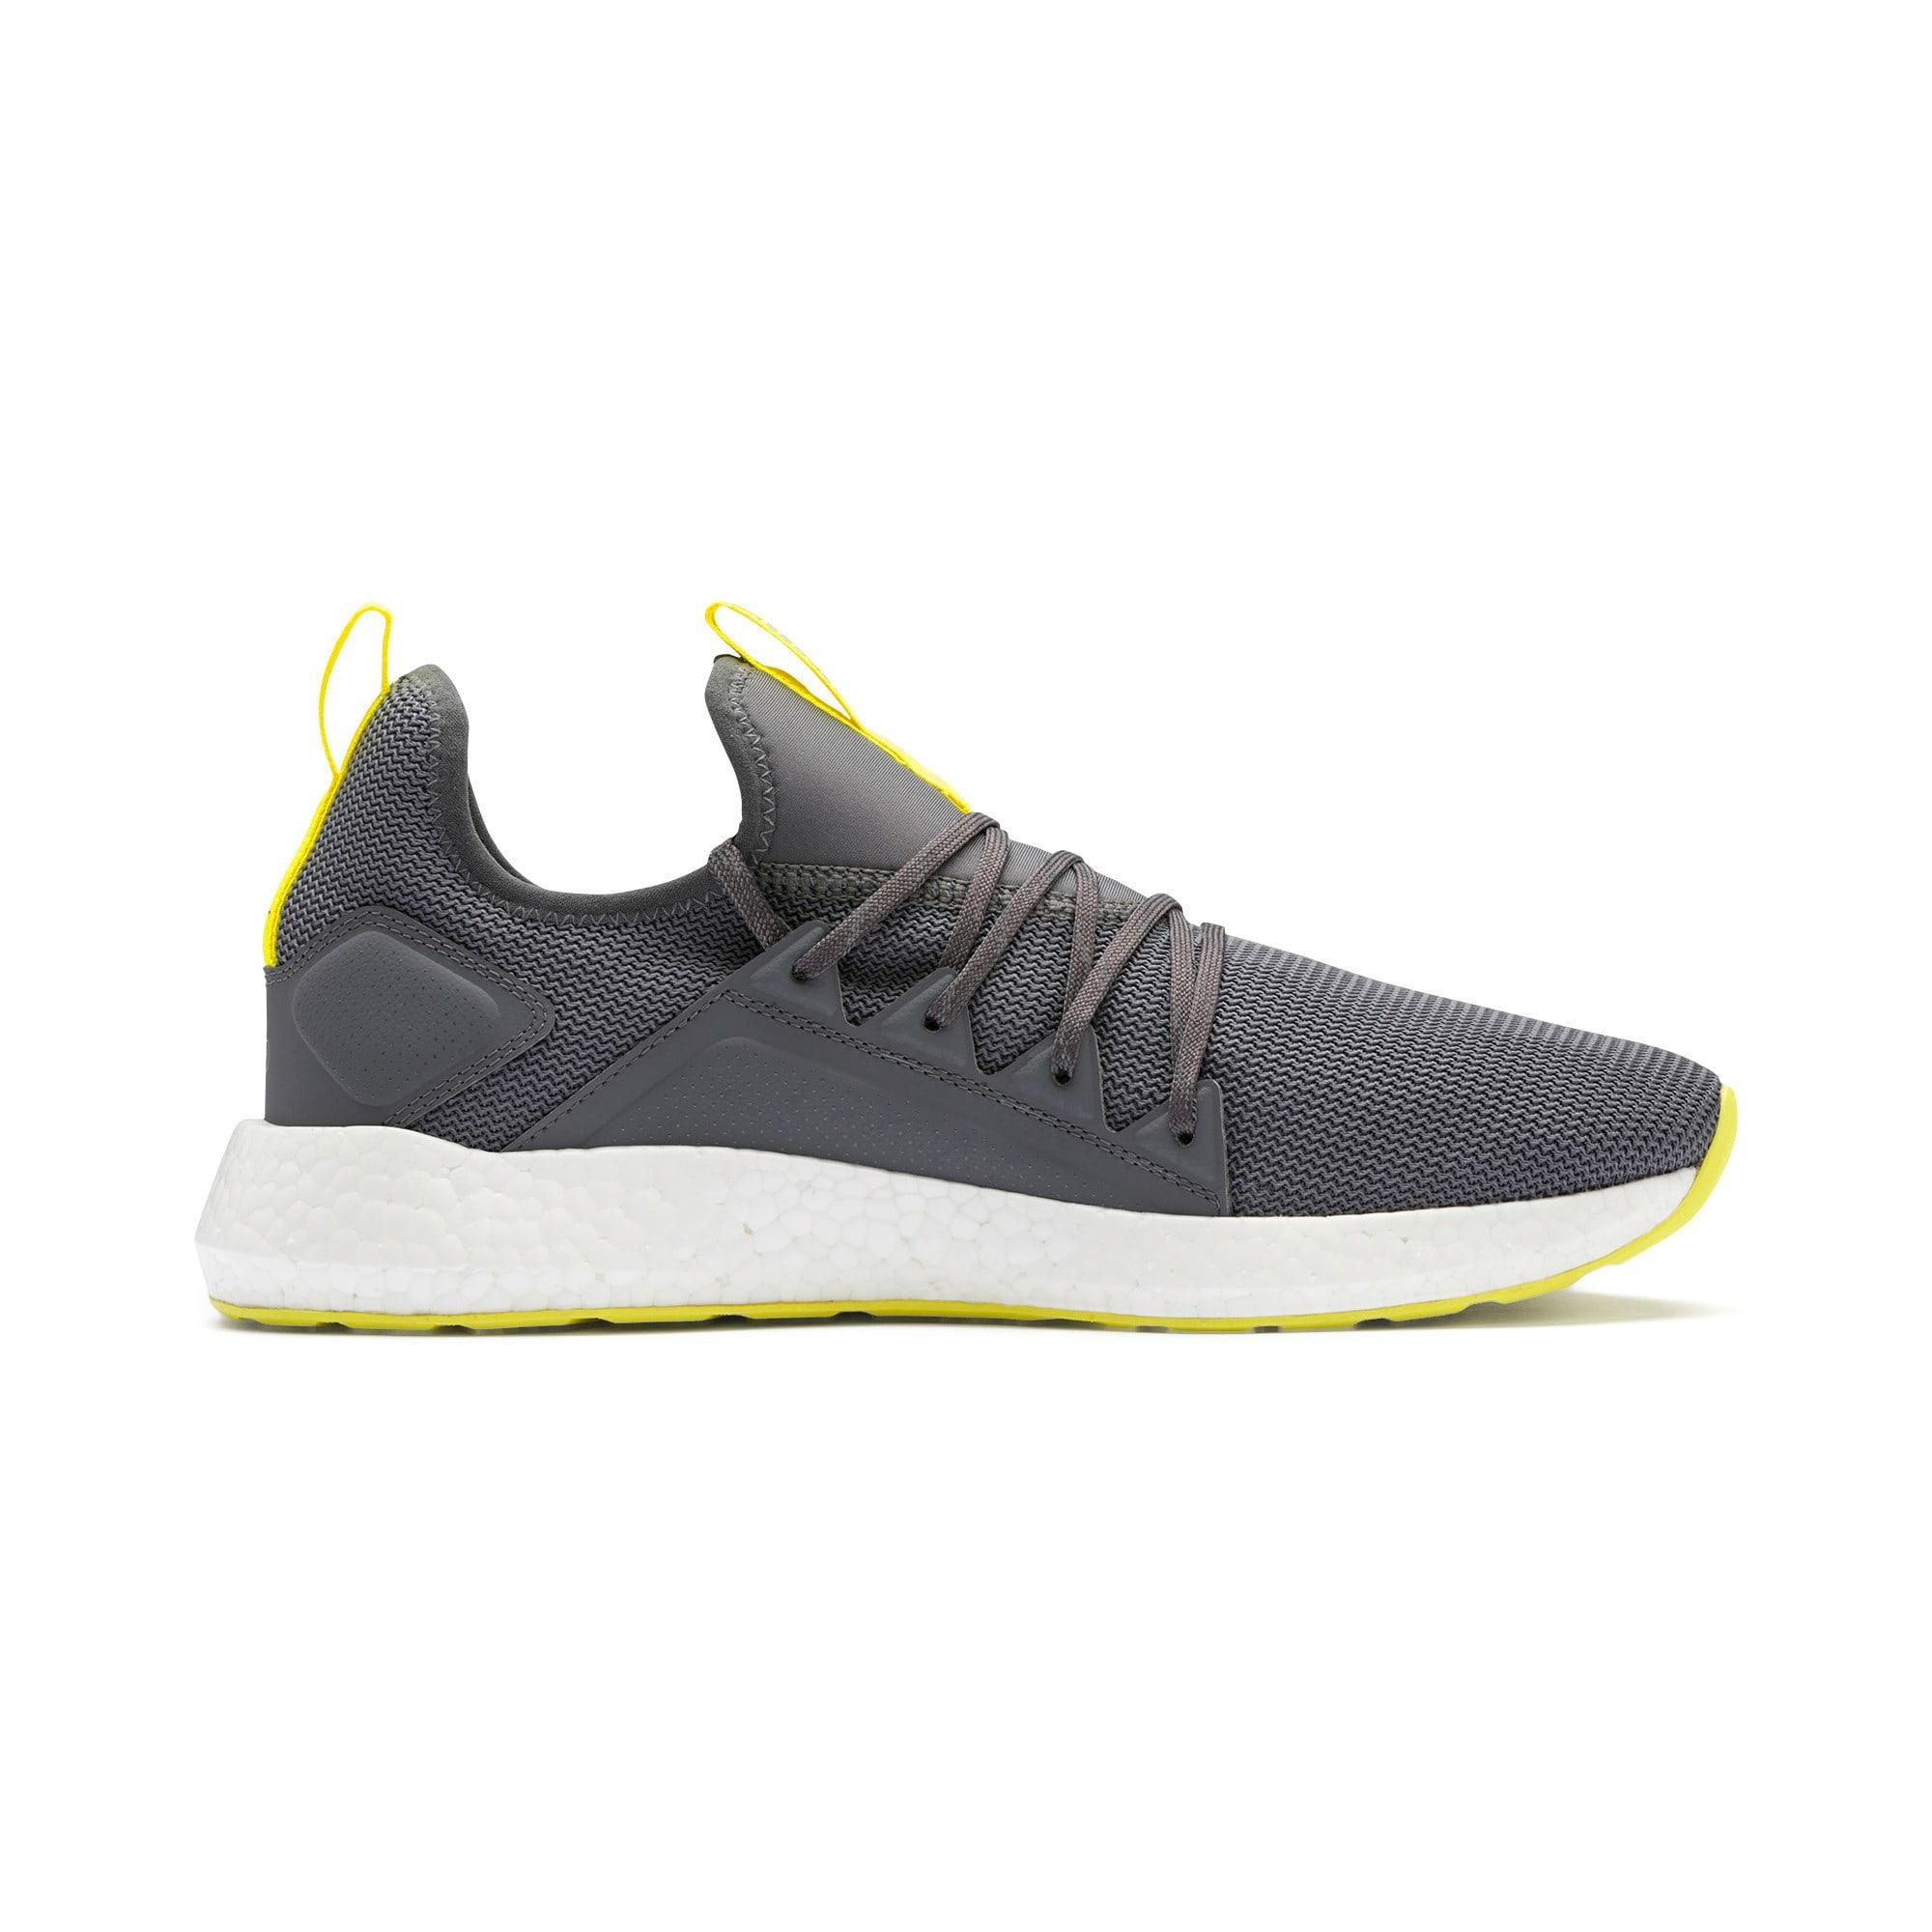 Thumbnail 5 of NRGY Neko Lights Men's Running Shoes, CASTLEROCK-Yellow Alert, medium-IND